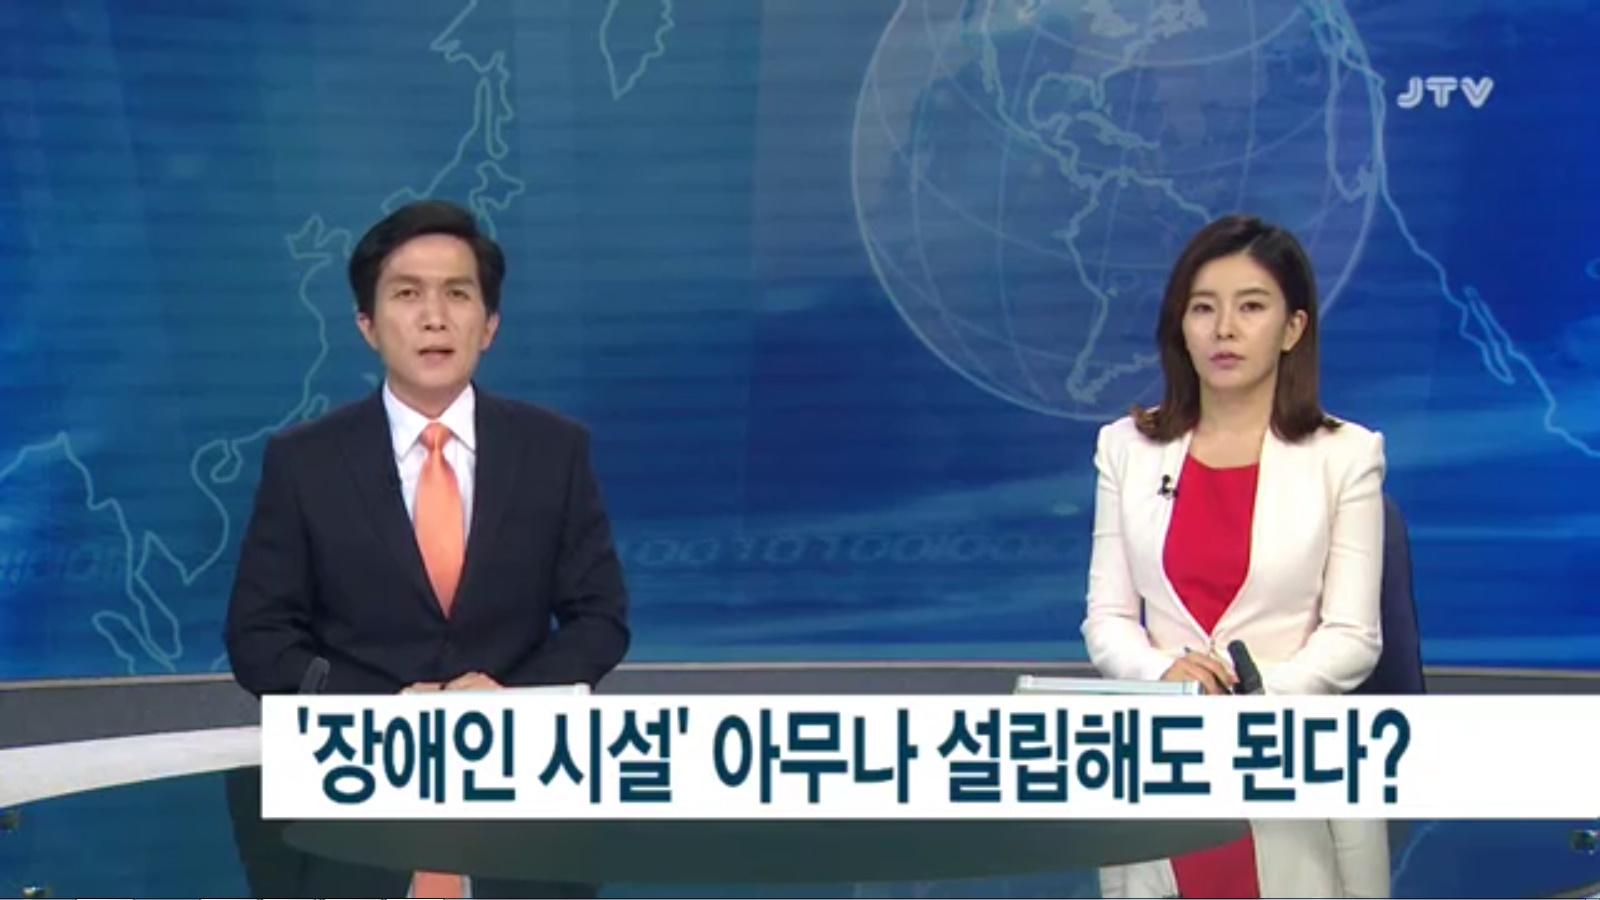 [18.7.25 JTV] 전주 봉침게이트, 검찰은 기소축소 법원은 재판거래... 의혹21.jpg